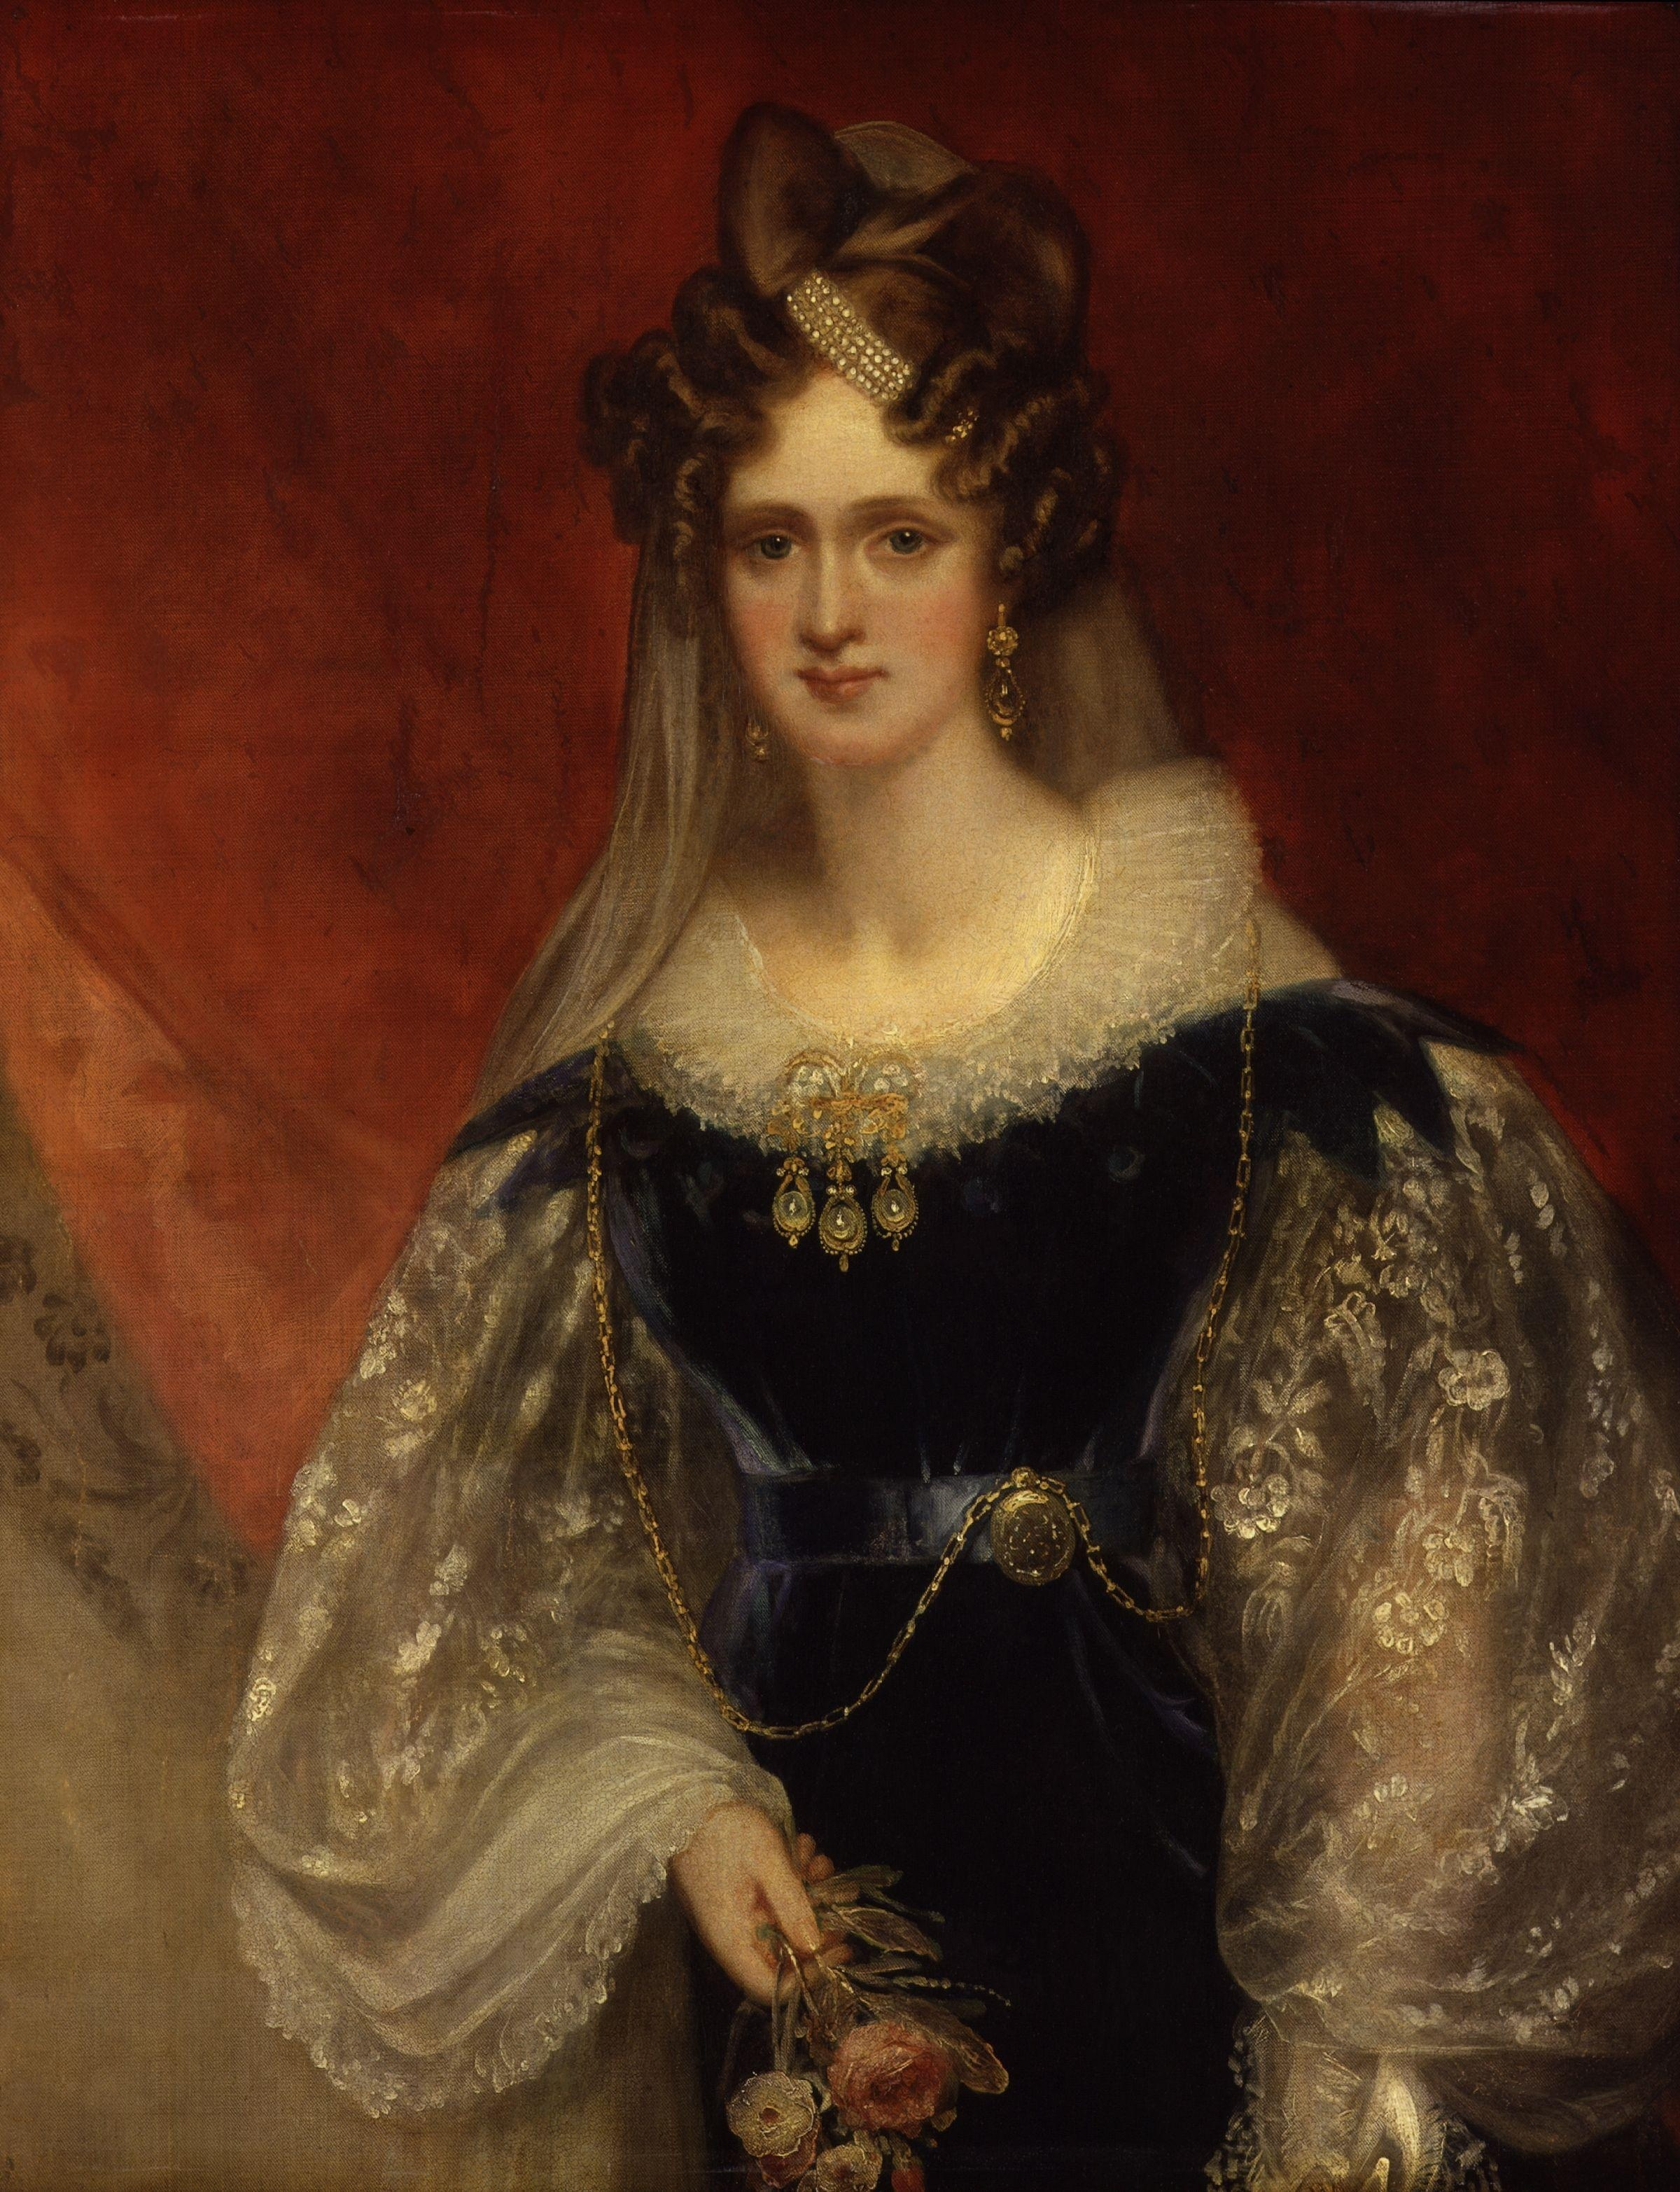 Adelaide amelia louisa theresa caroline of saxe coburg meiningen sir william beechey